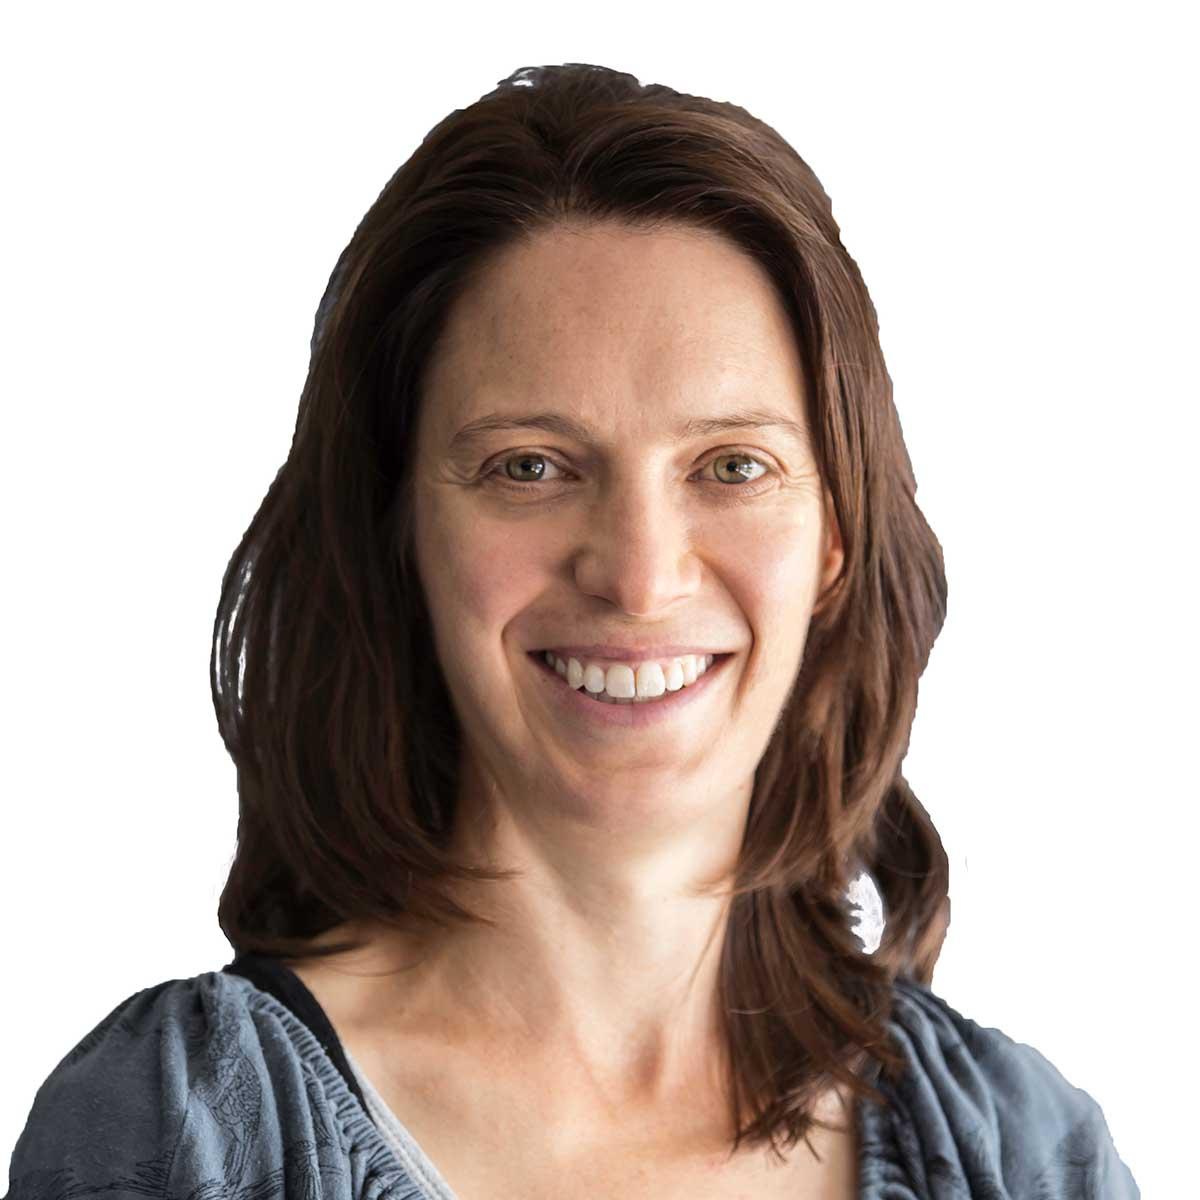 Vanessa Hoete